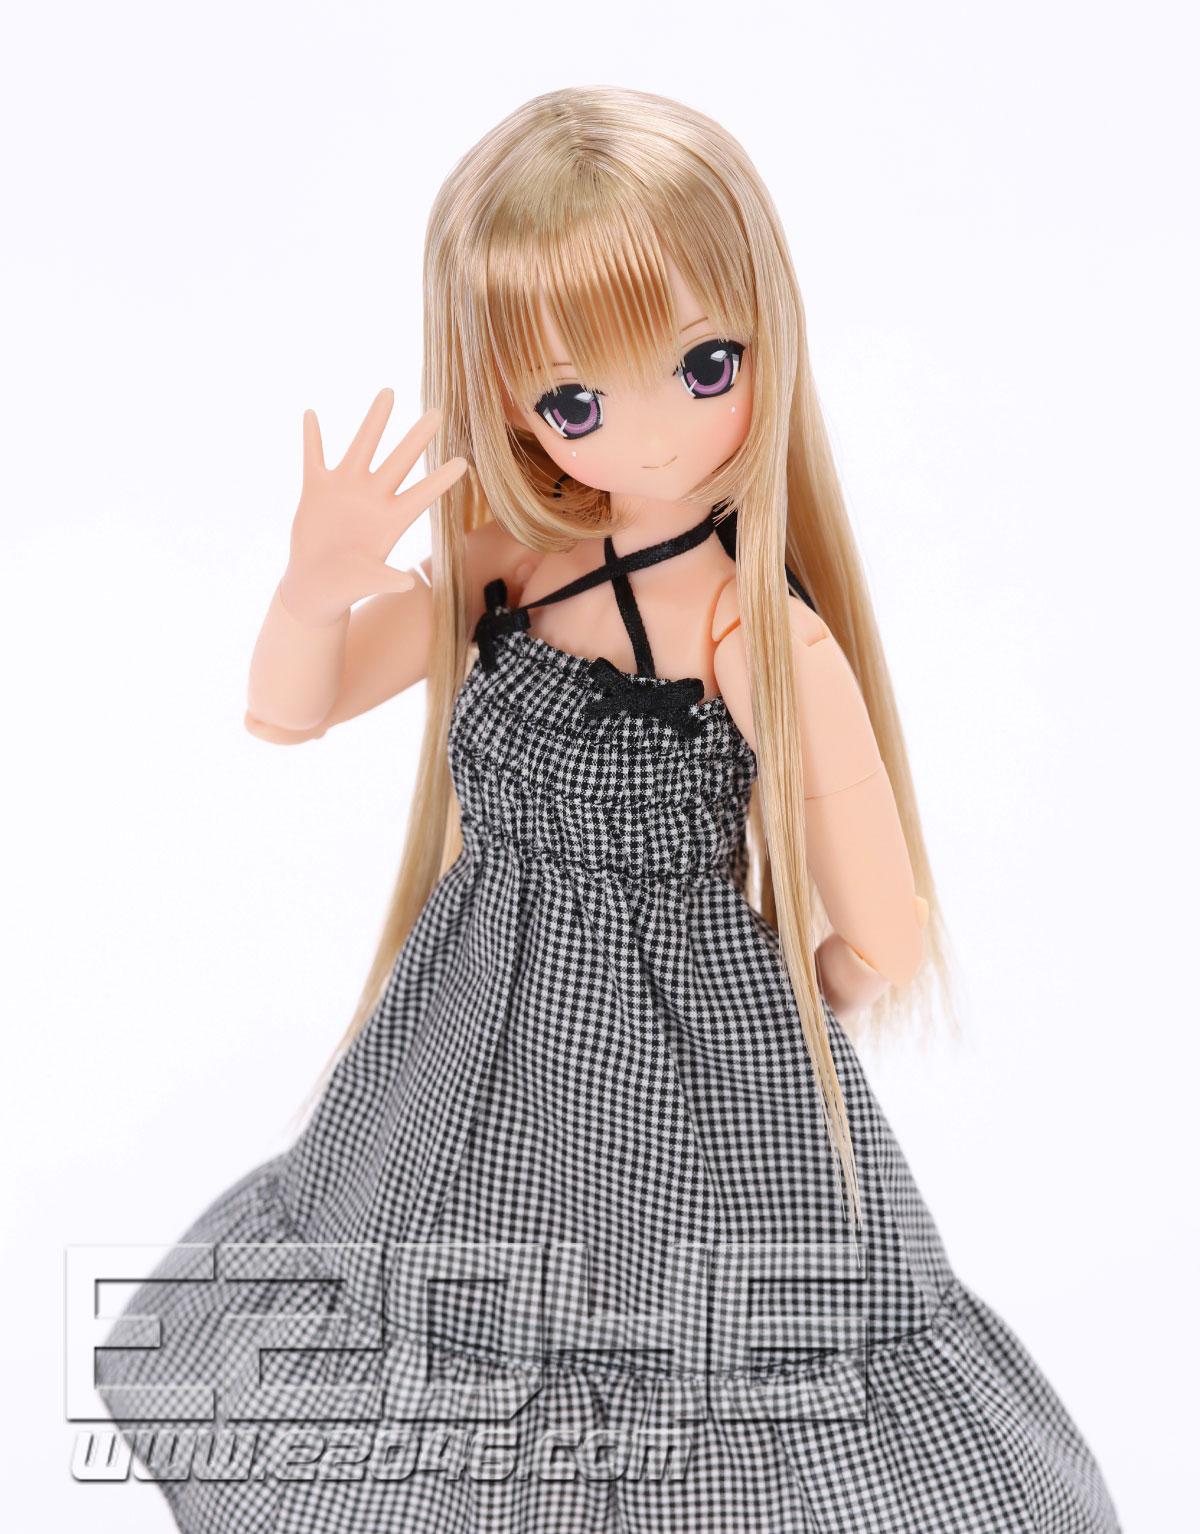 Lycee  Blonde Hair Version (DOLL)